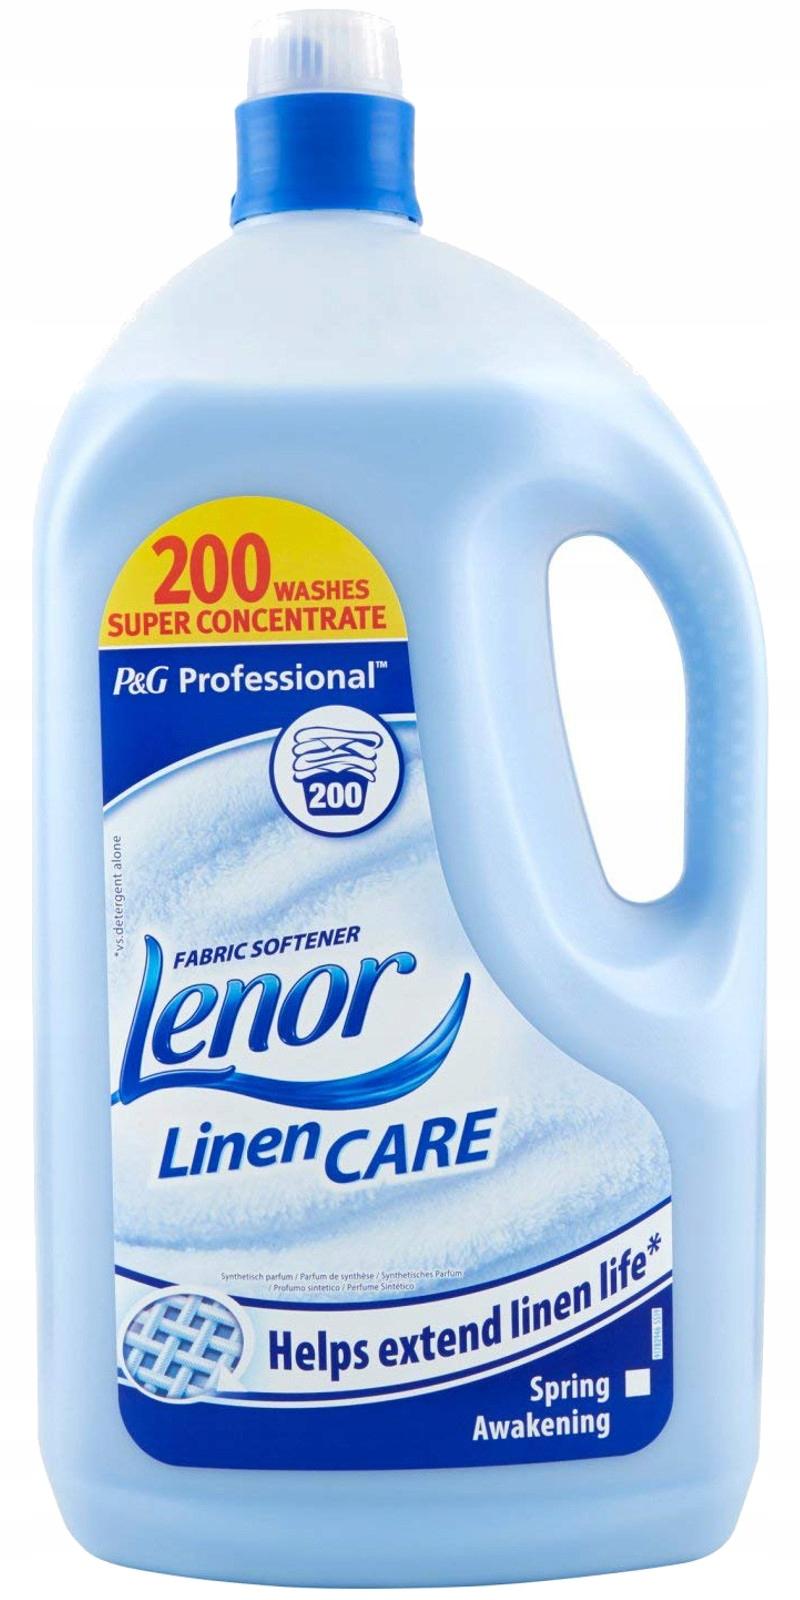 Ленор Весна Пробуждение Blue Liquid 4L 200pr Великобритания